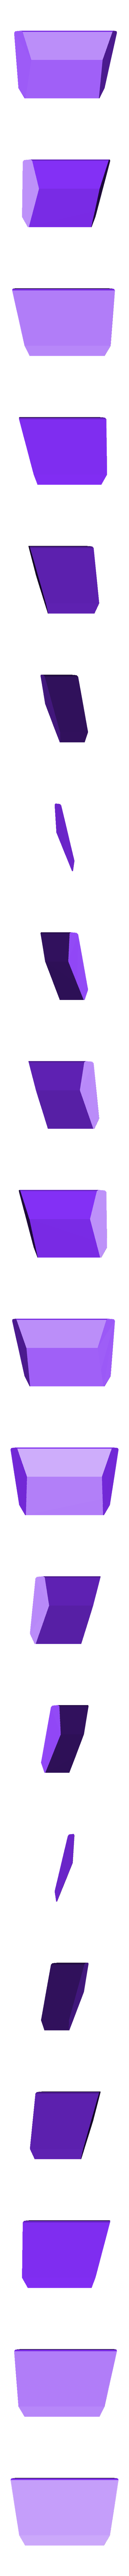 Eagle_Front_Lights.stl Download free STL file Eagle Multi Colour/Material (Elite Dangerous) • 3D print object, Kahnindustries